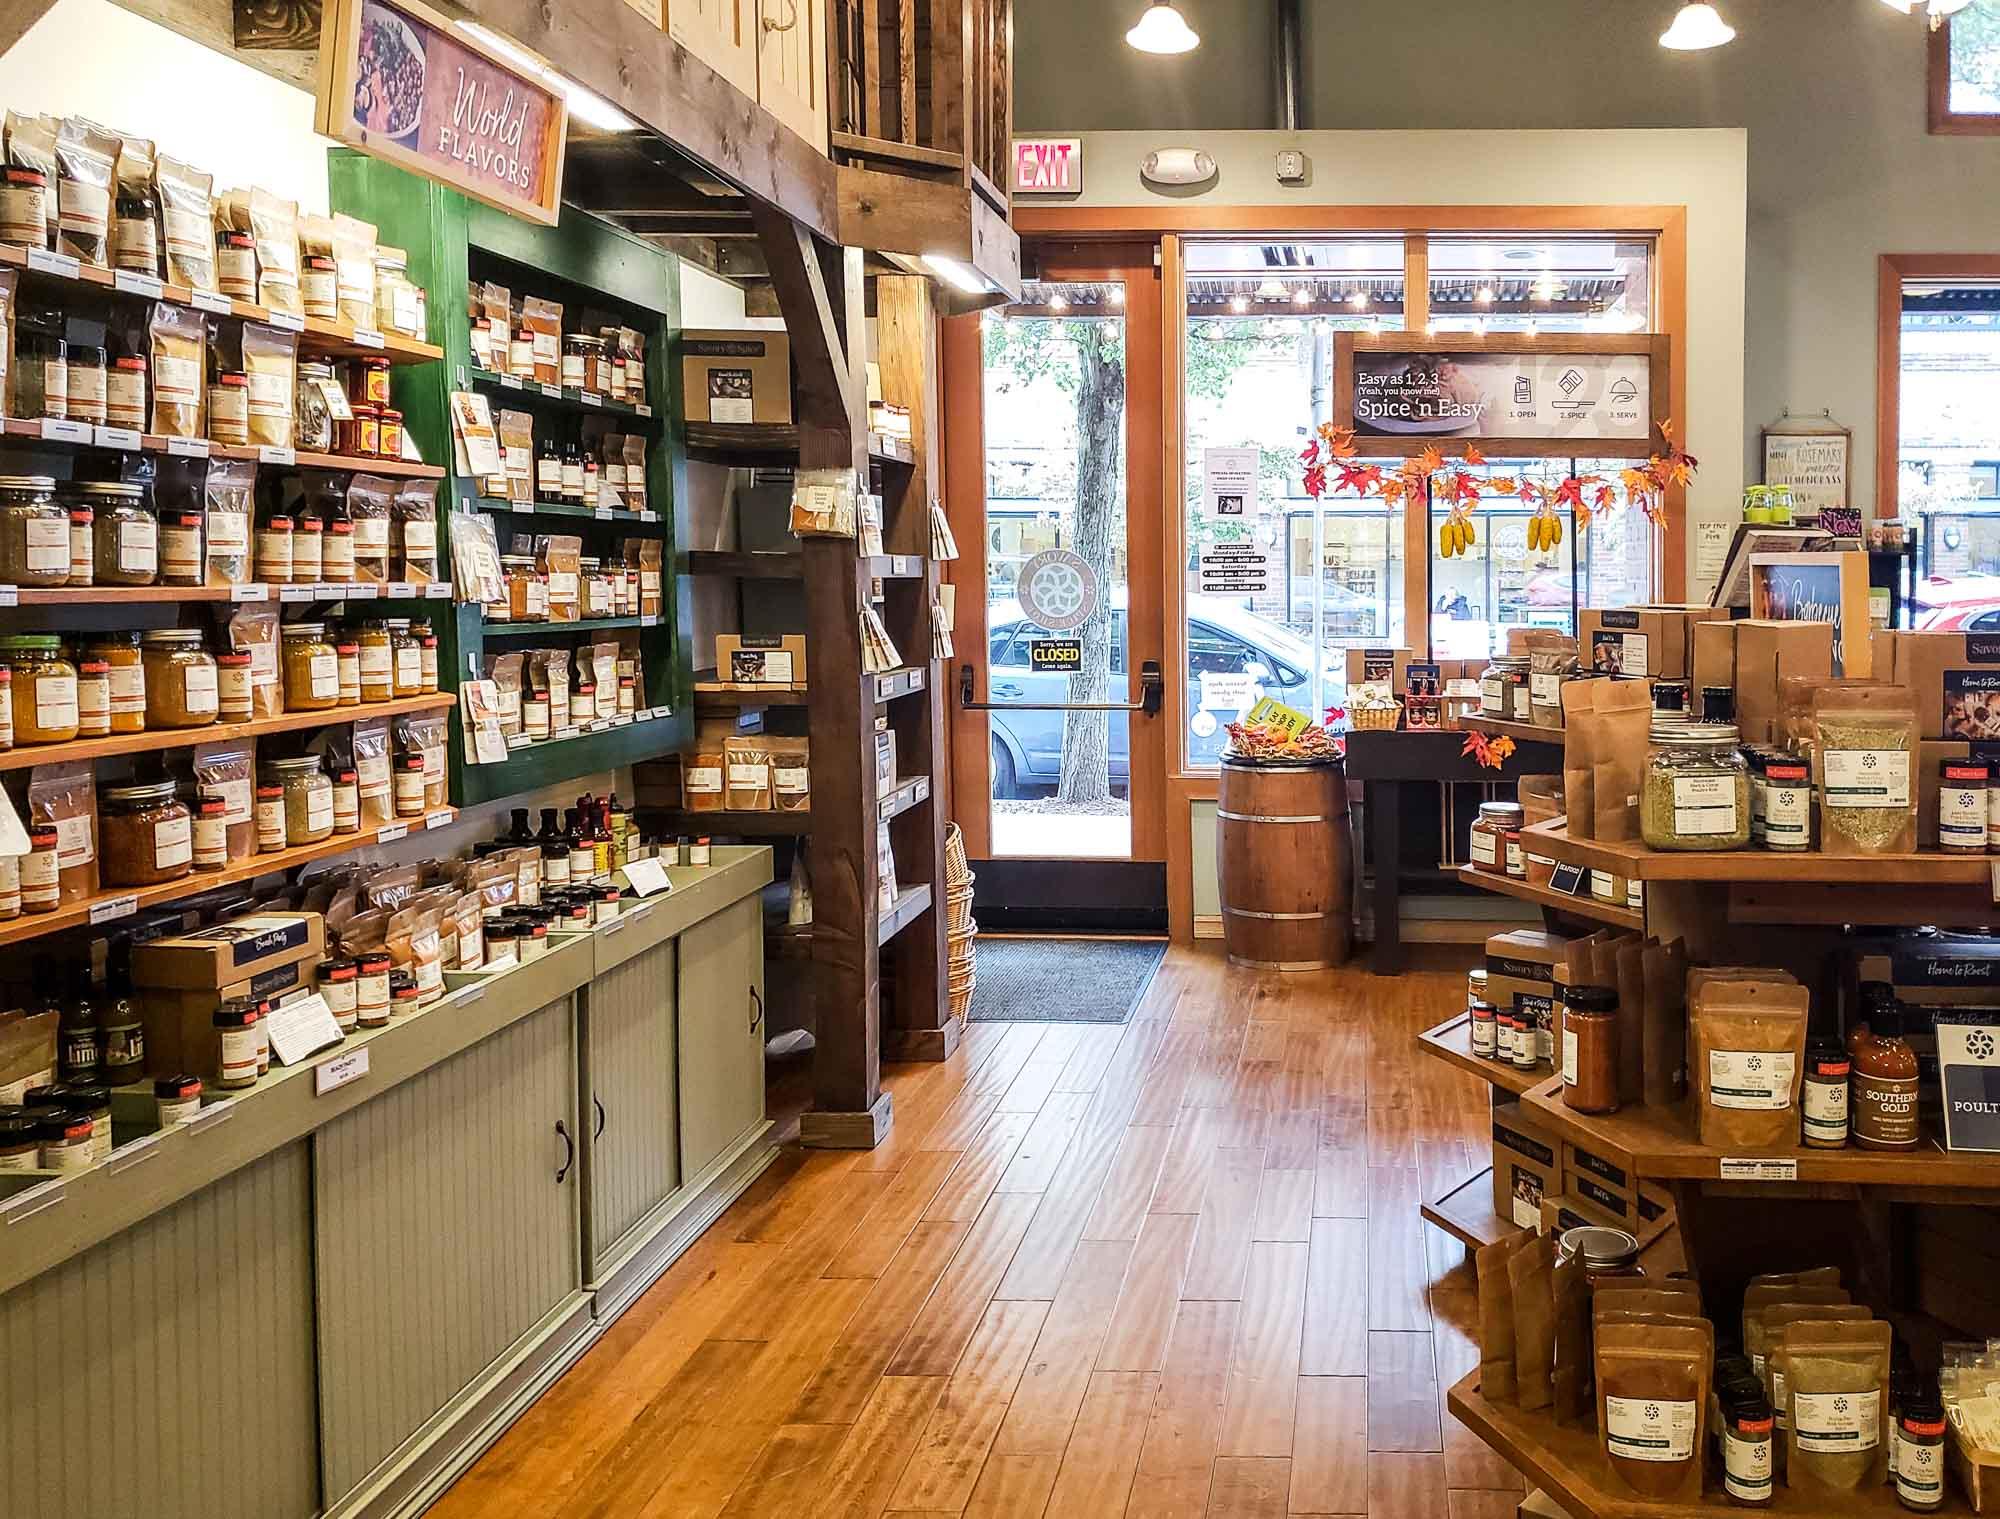 visit-sellwood-moreland-business-alliance_savory-spice-shop-sellwood-3.jpg